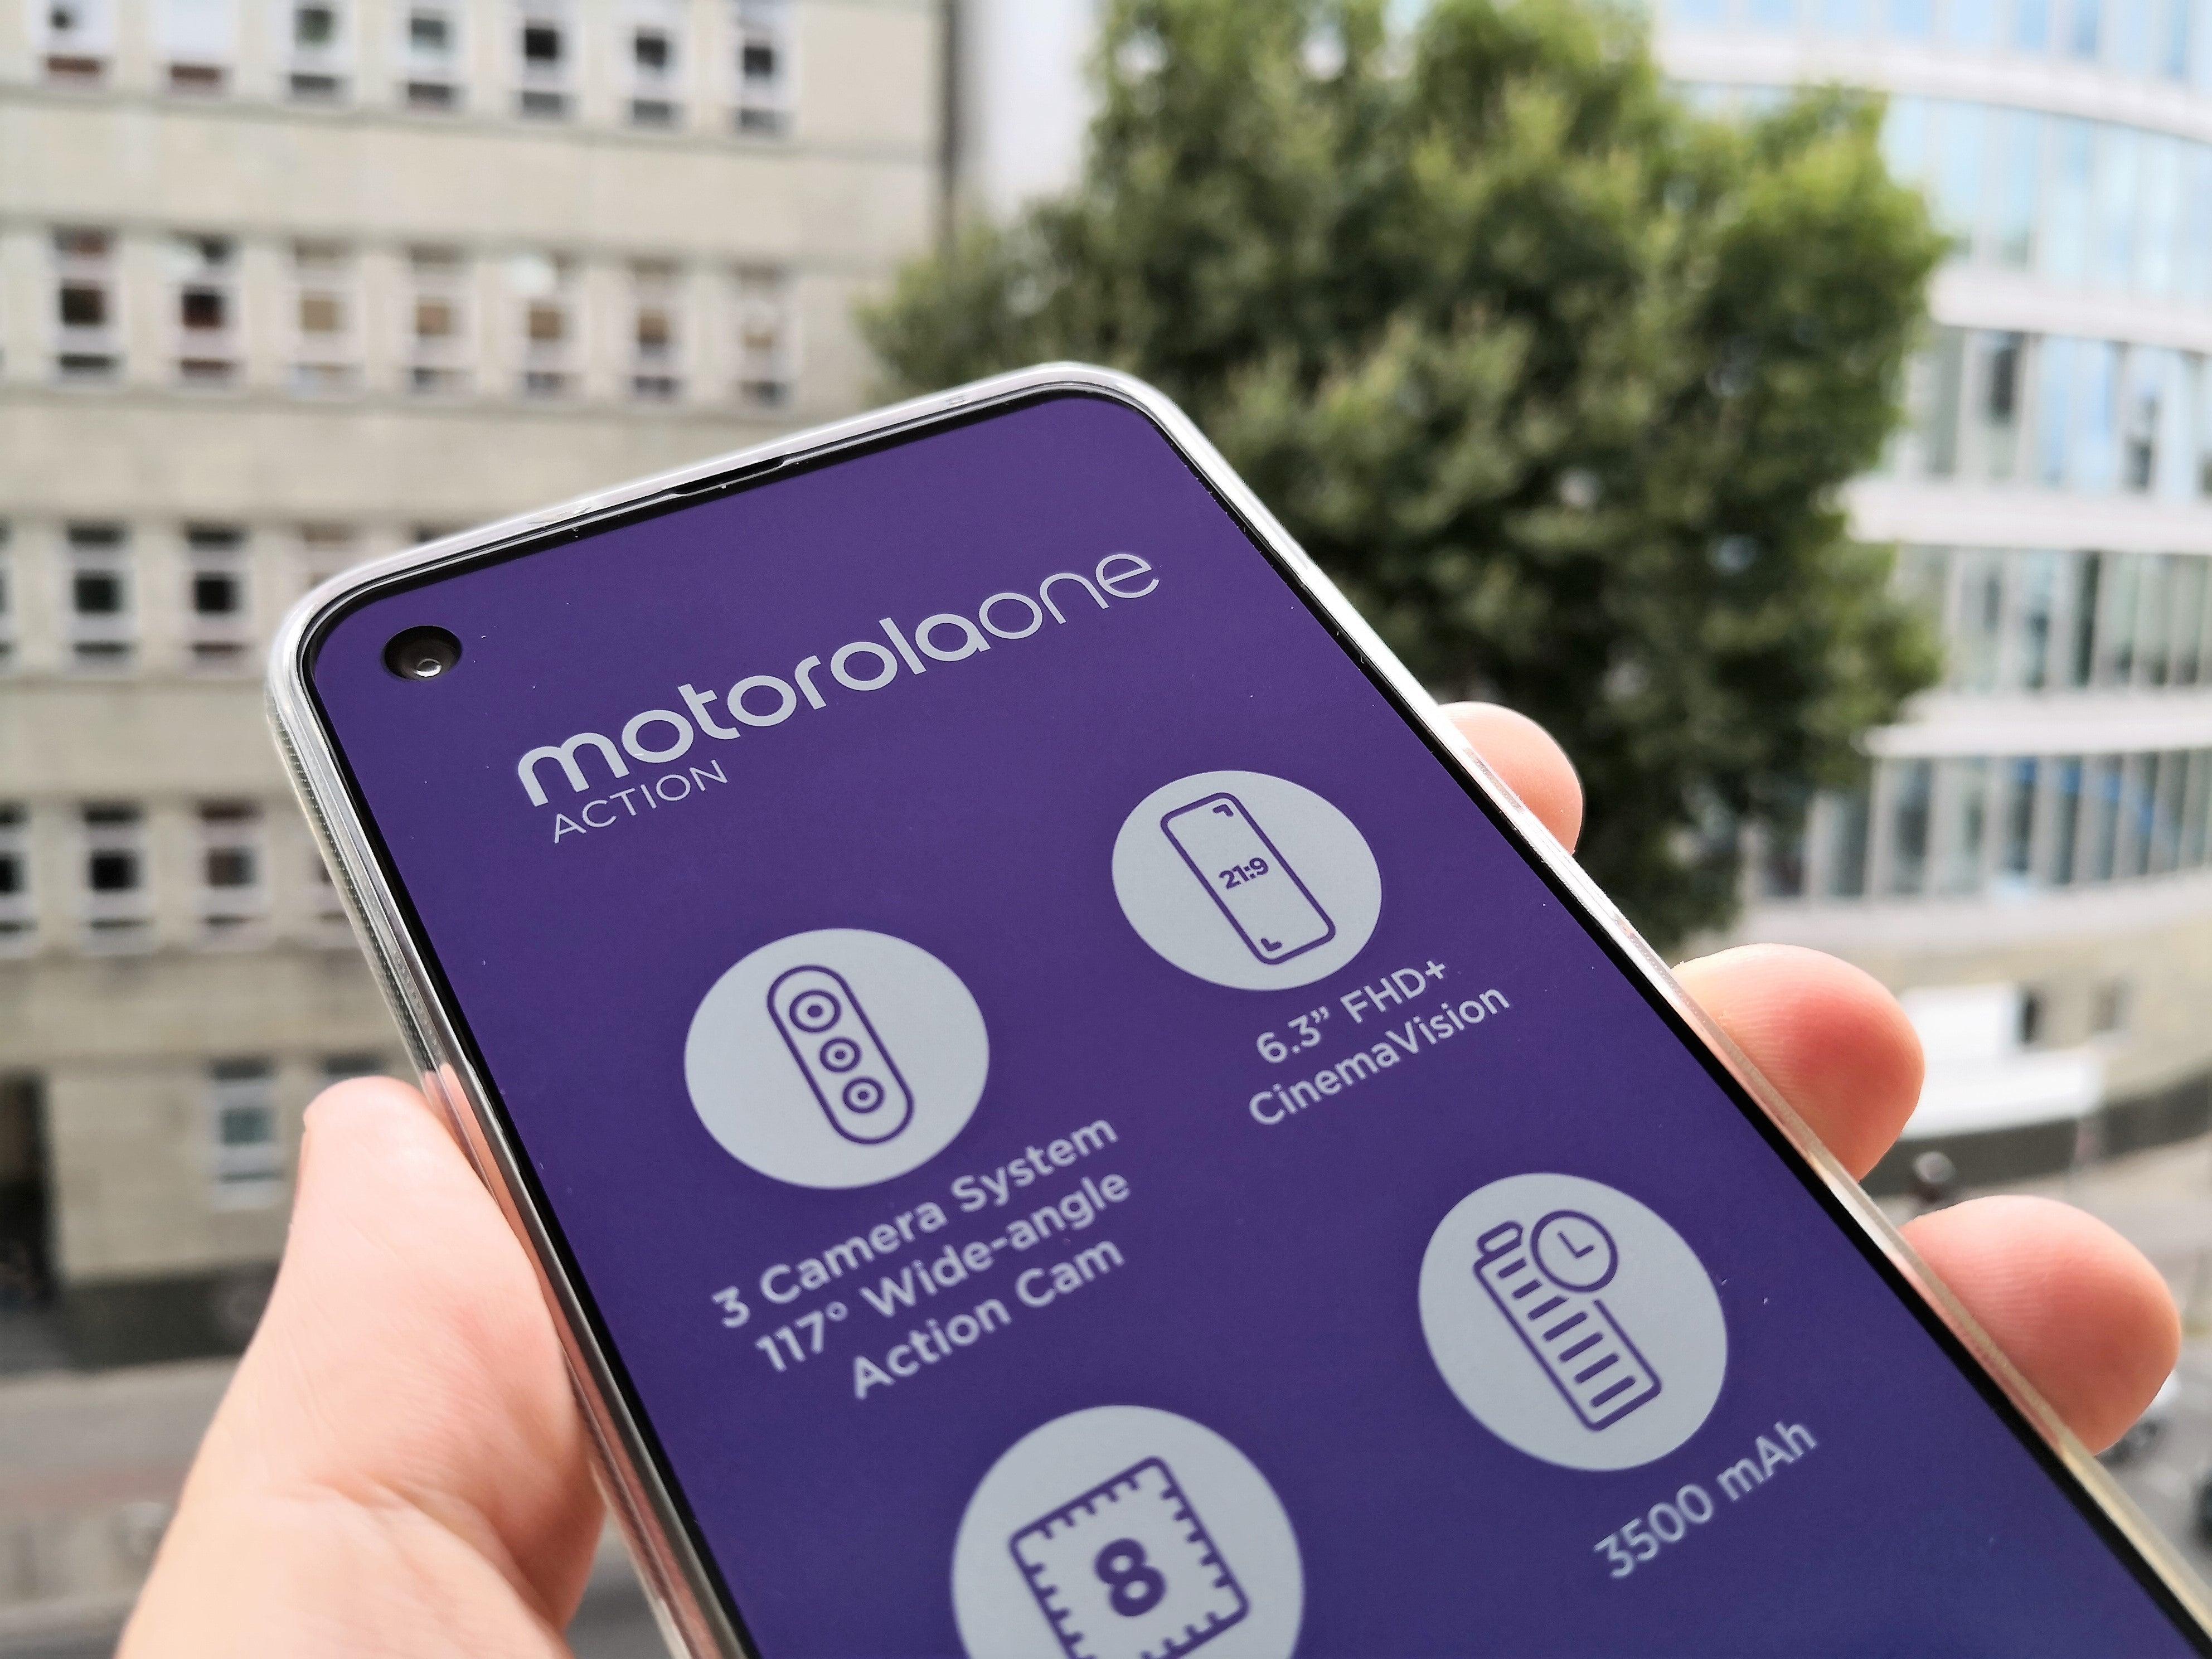 Motorola one action hands-on